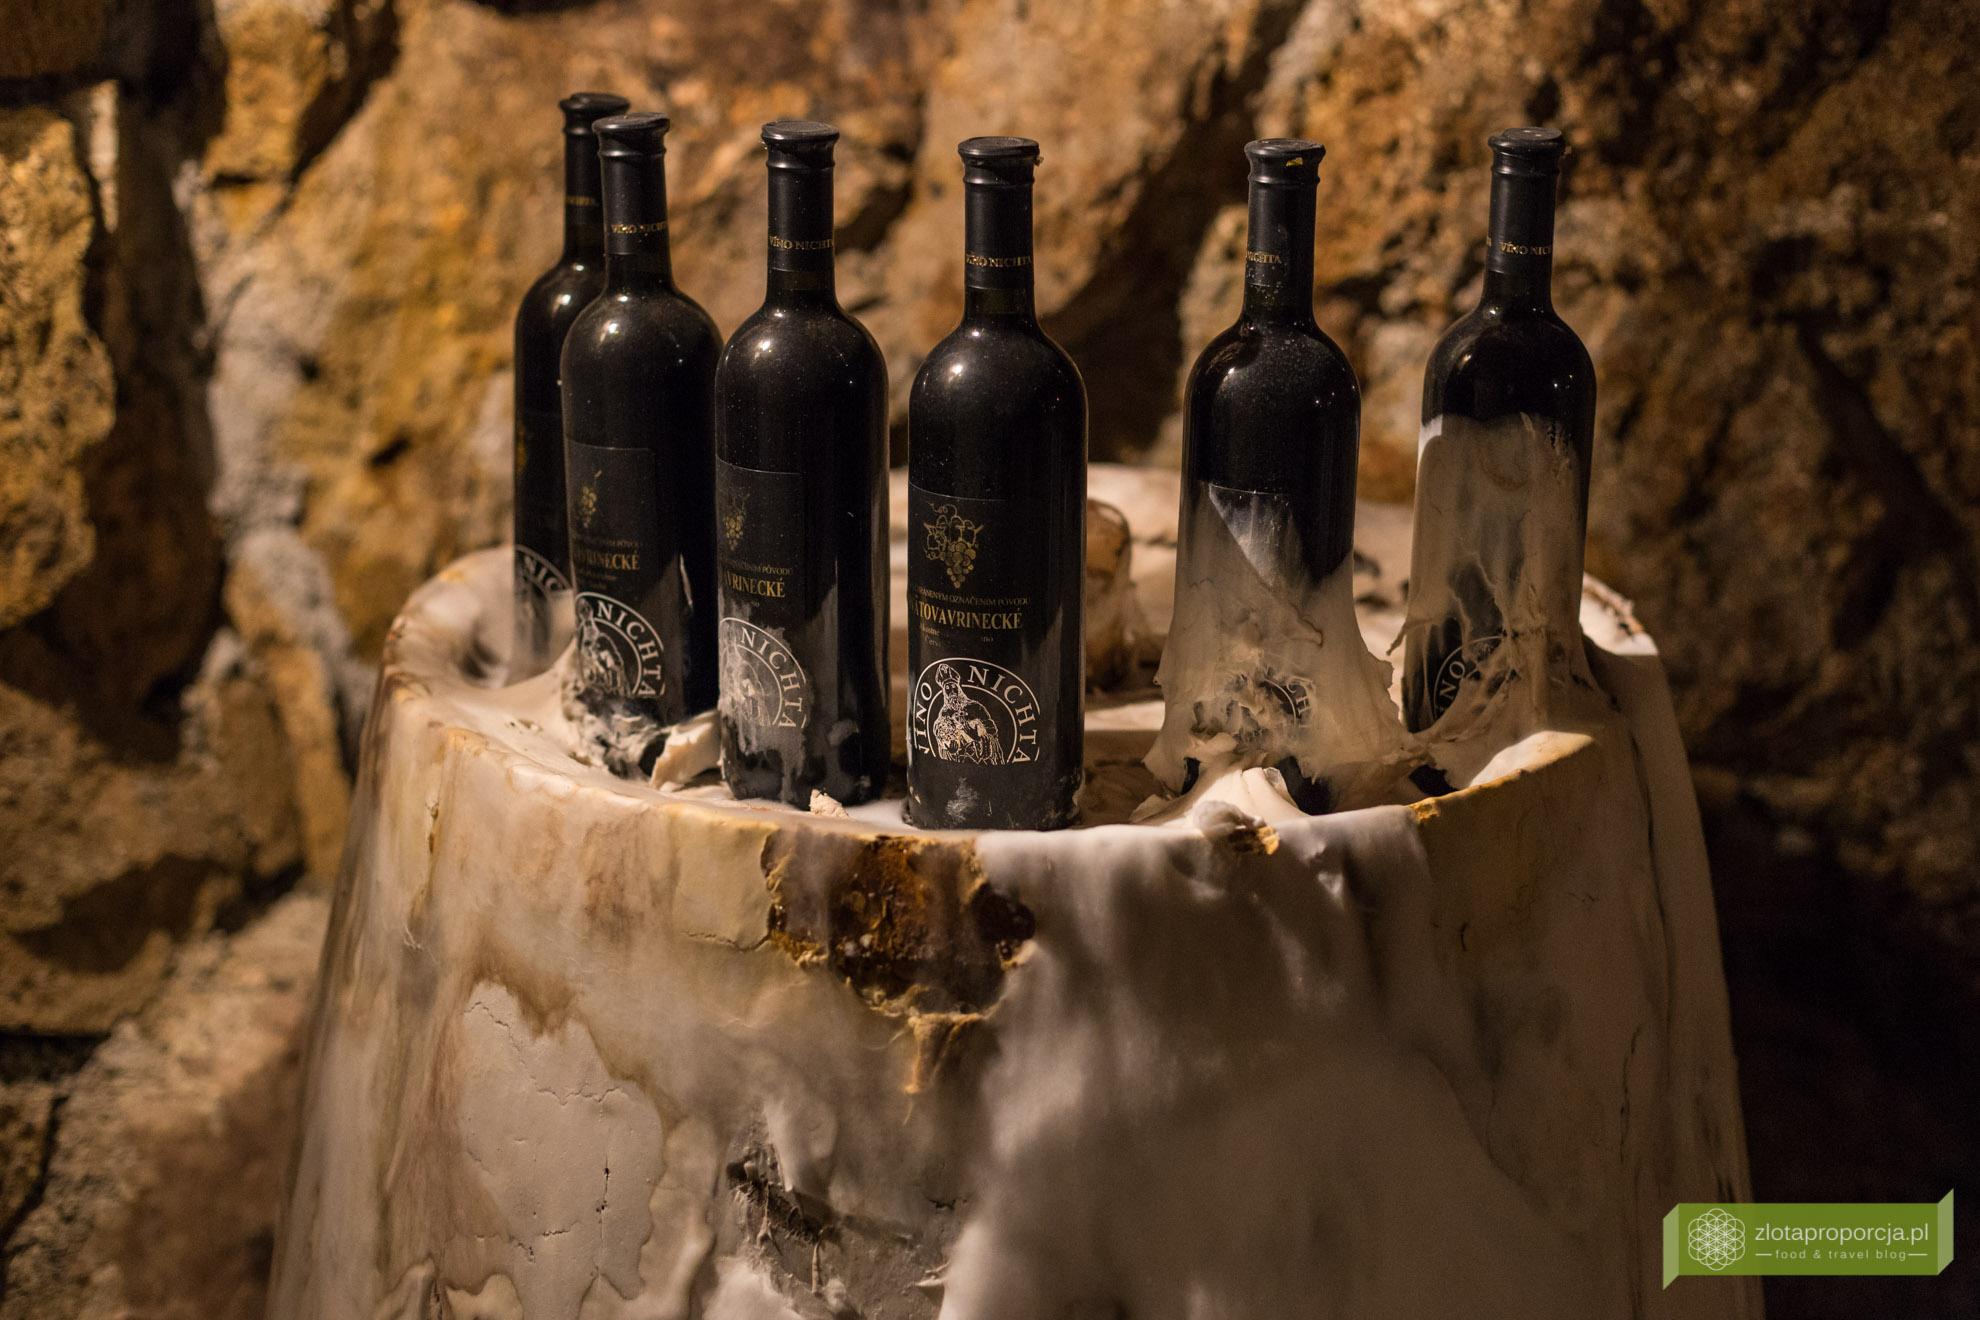 winnica Barko, Karpacki Szlak Wina, winnice na Słowacji